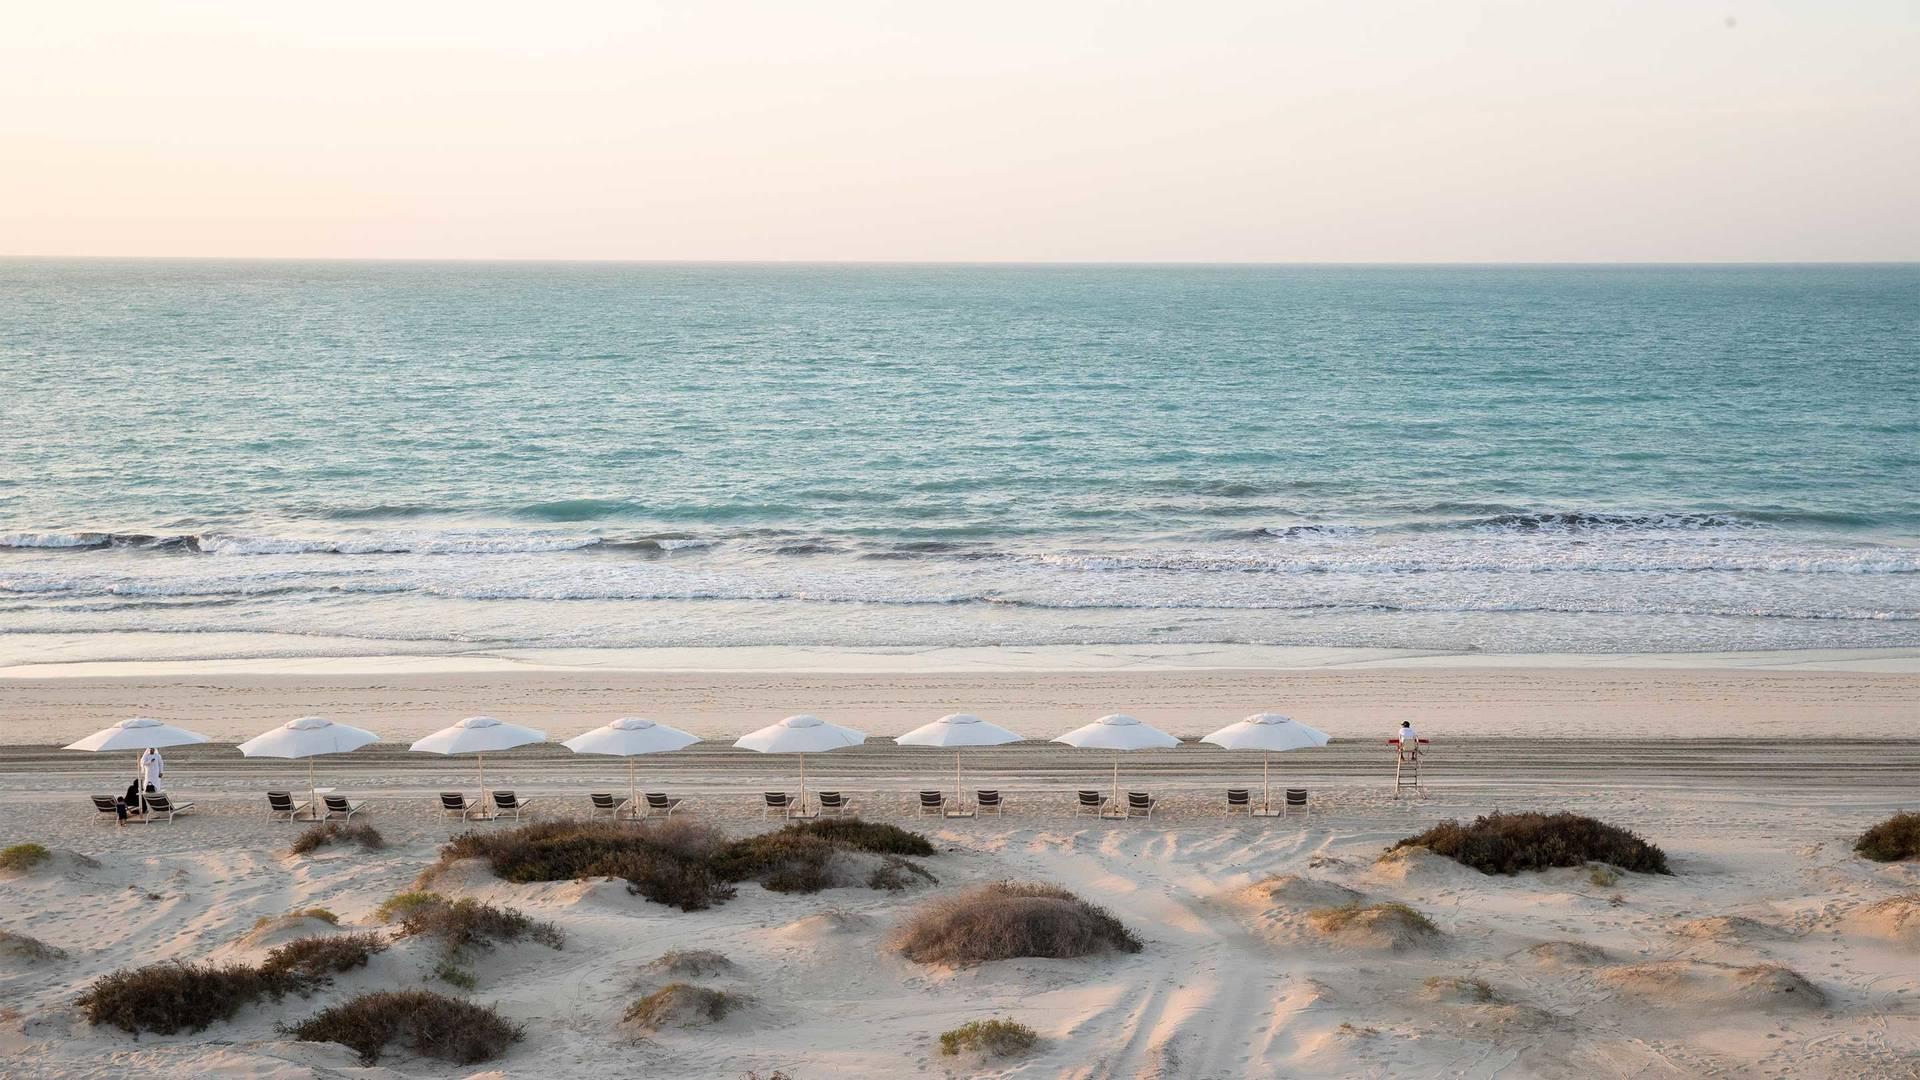 12_16-9 Jumeirah-at-Saadiyat-Island-Resort---Beach-view